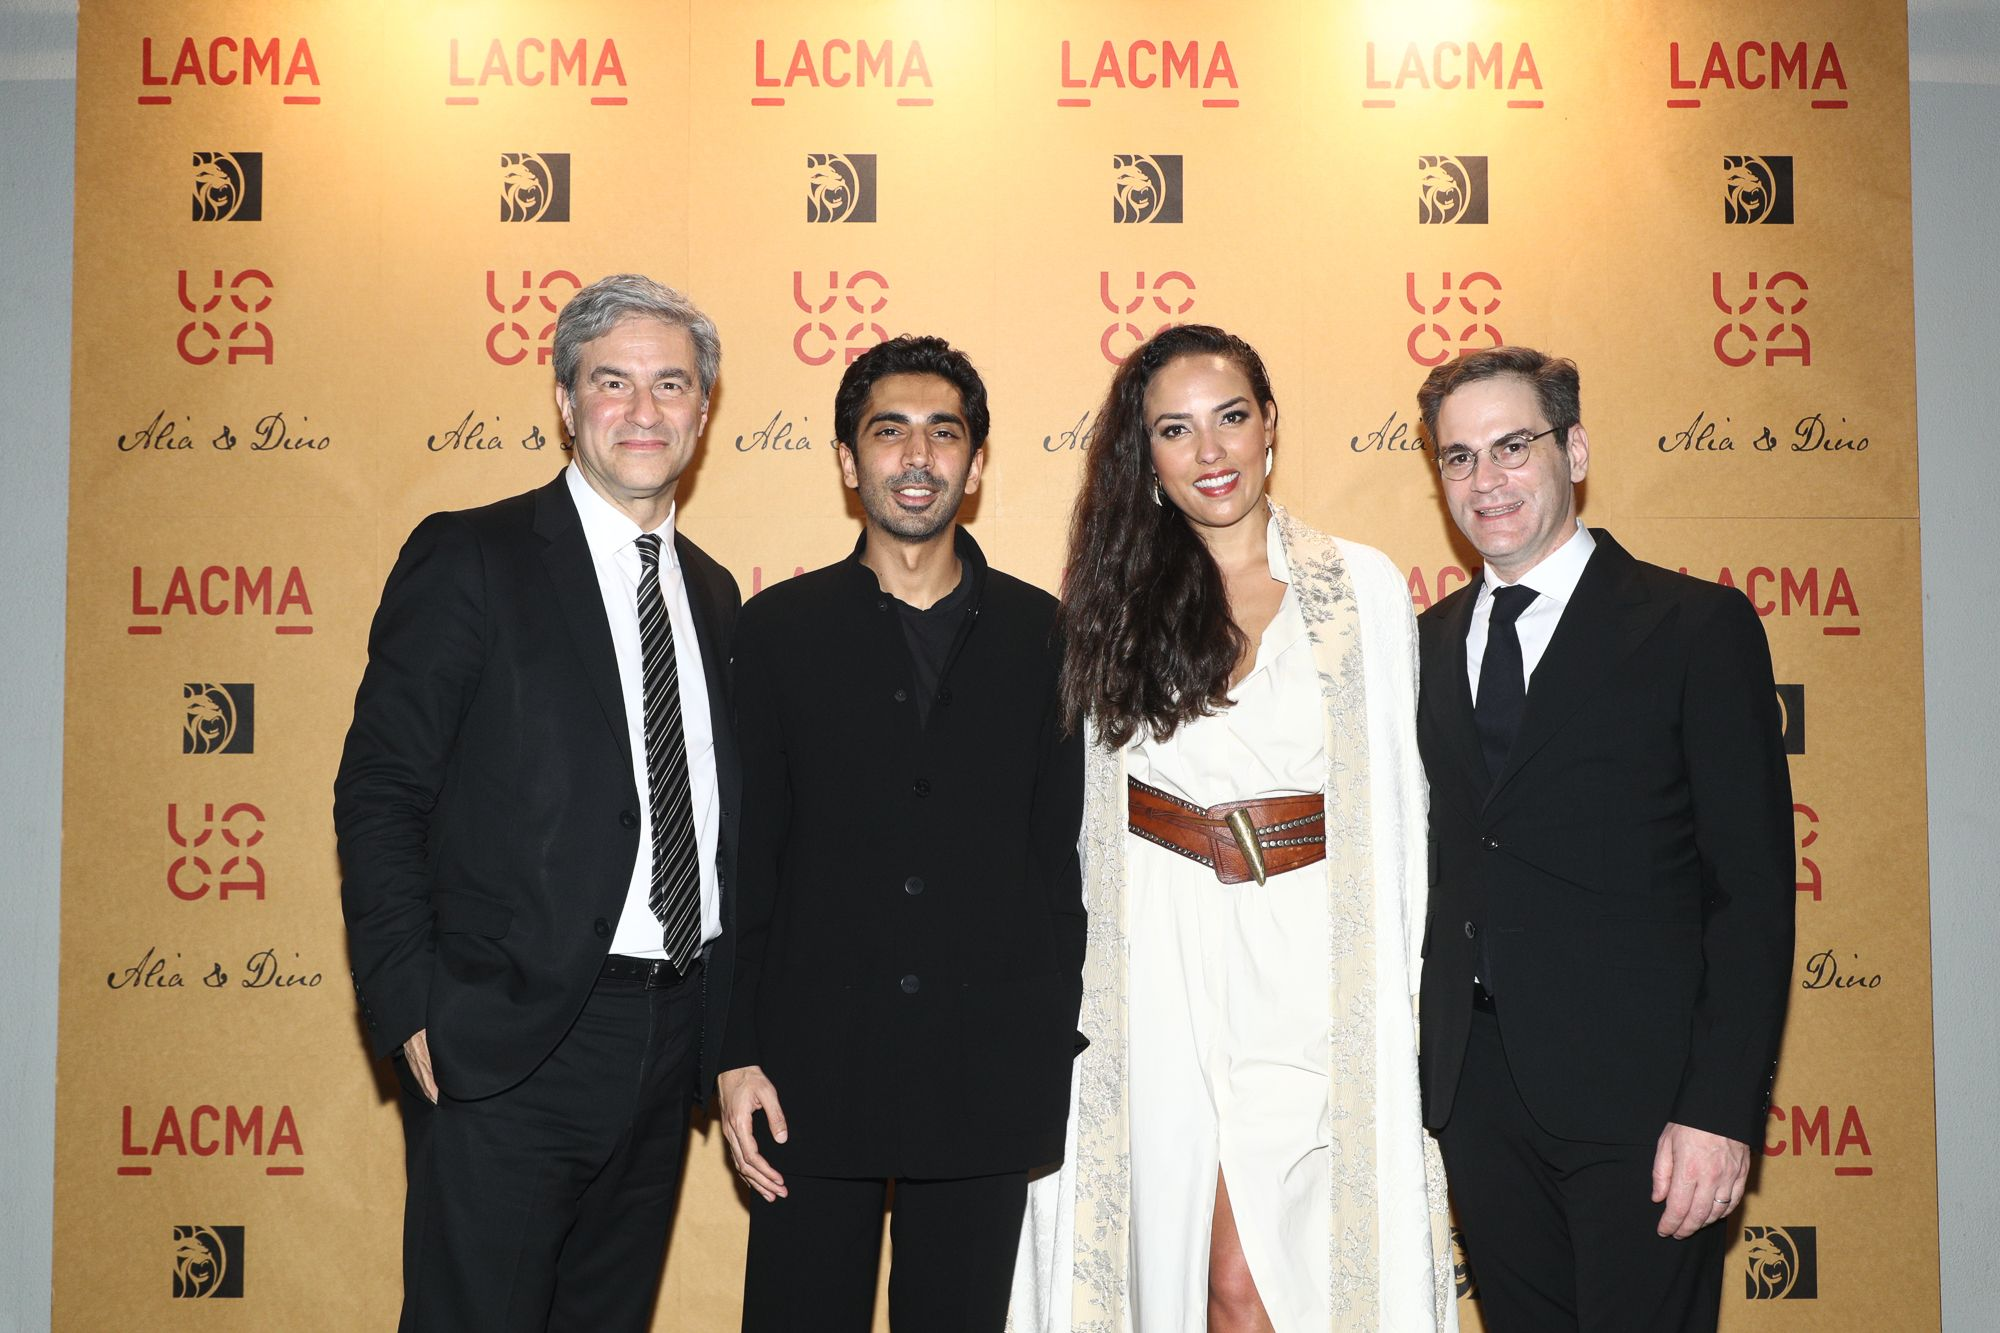 Michael Govan, Dino Sadhwani, Princess Alia Al-Senussi, Philip Tinari